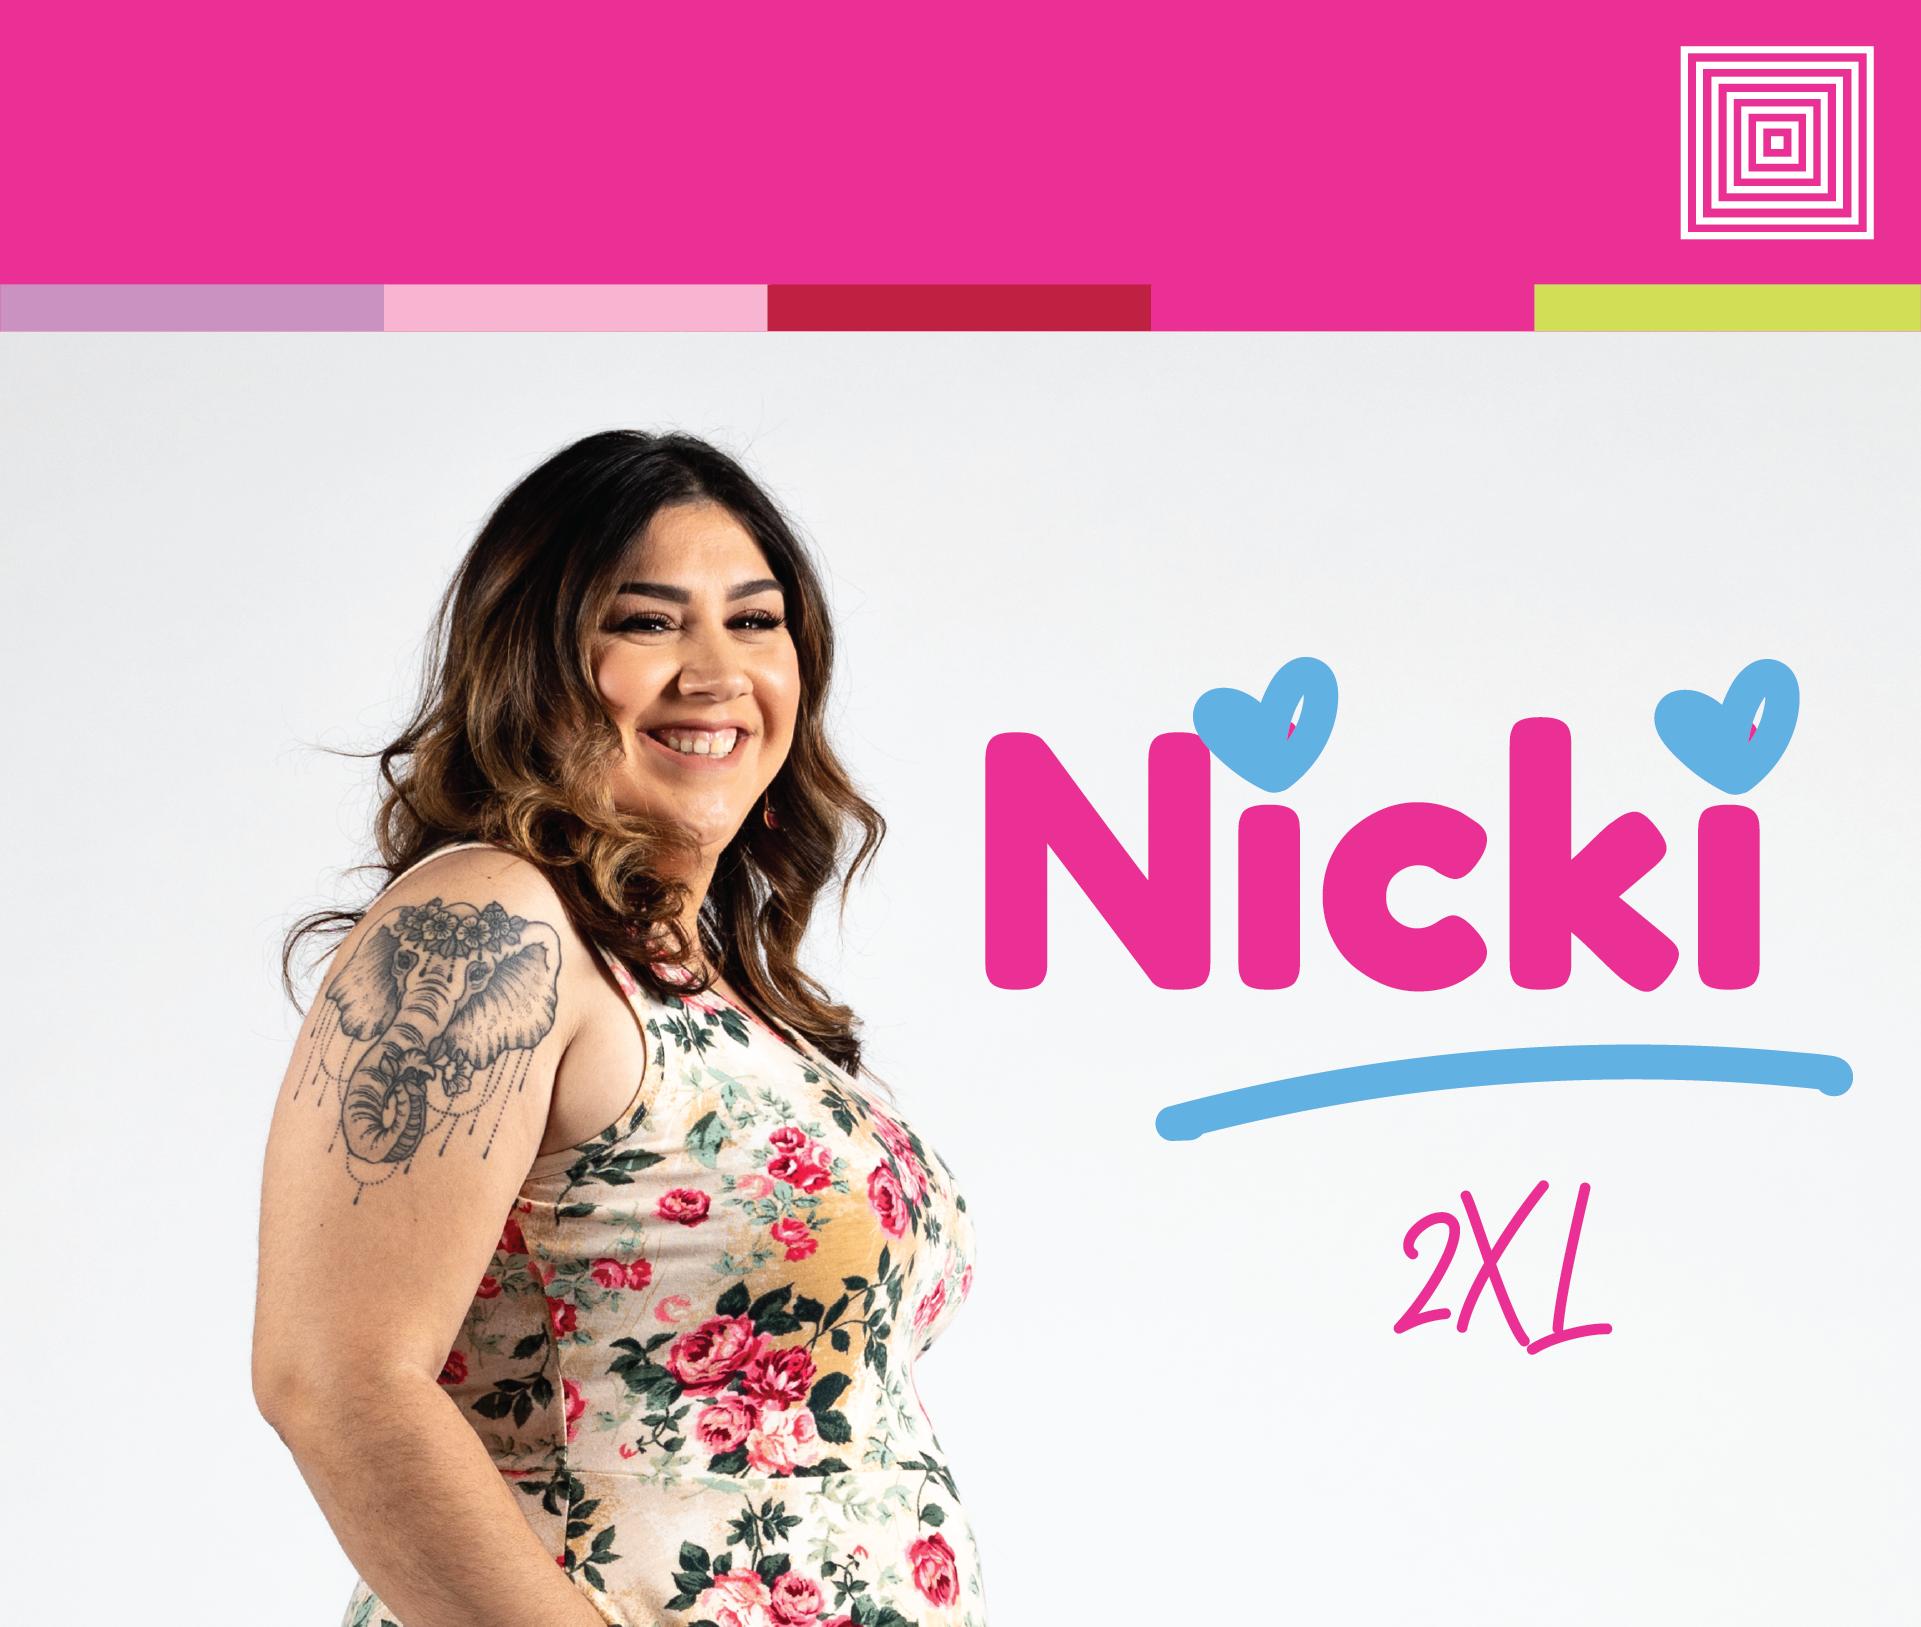 a22008c1a LuLaRoe Nicki Sleeveless A-Line Dress 2XL Size — LuLaRoe Sleeveless ...